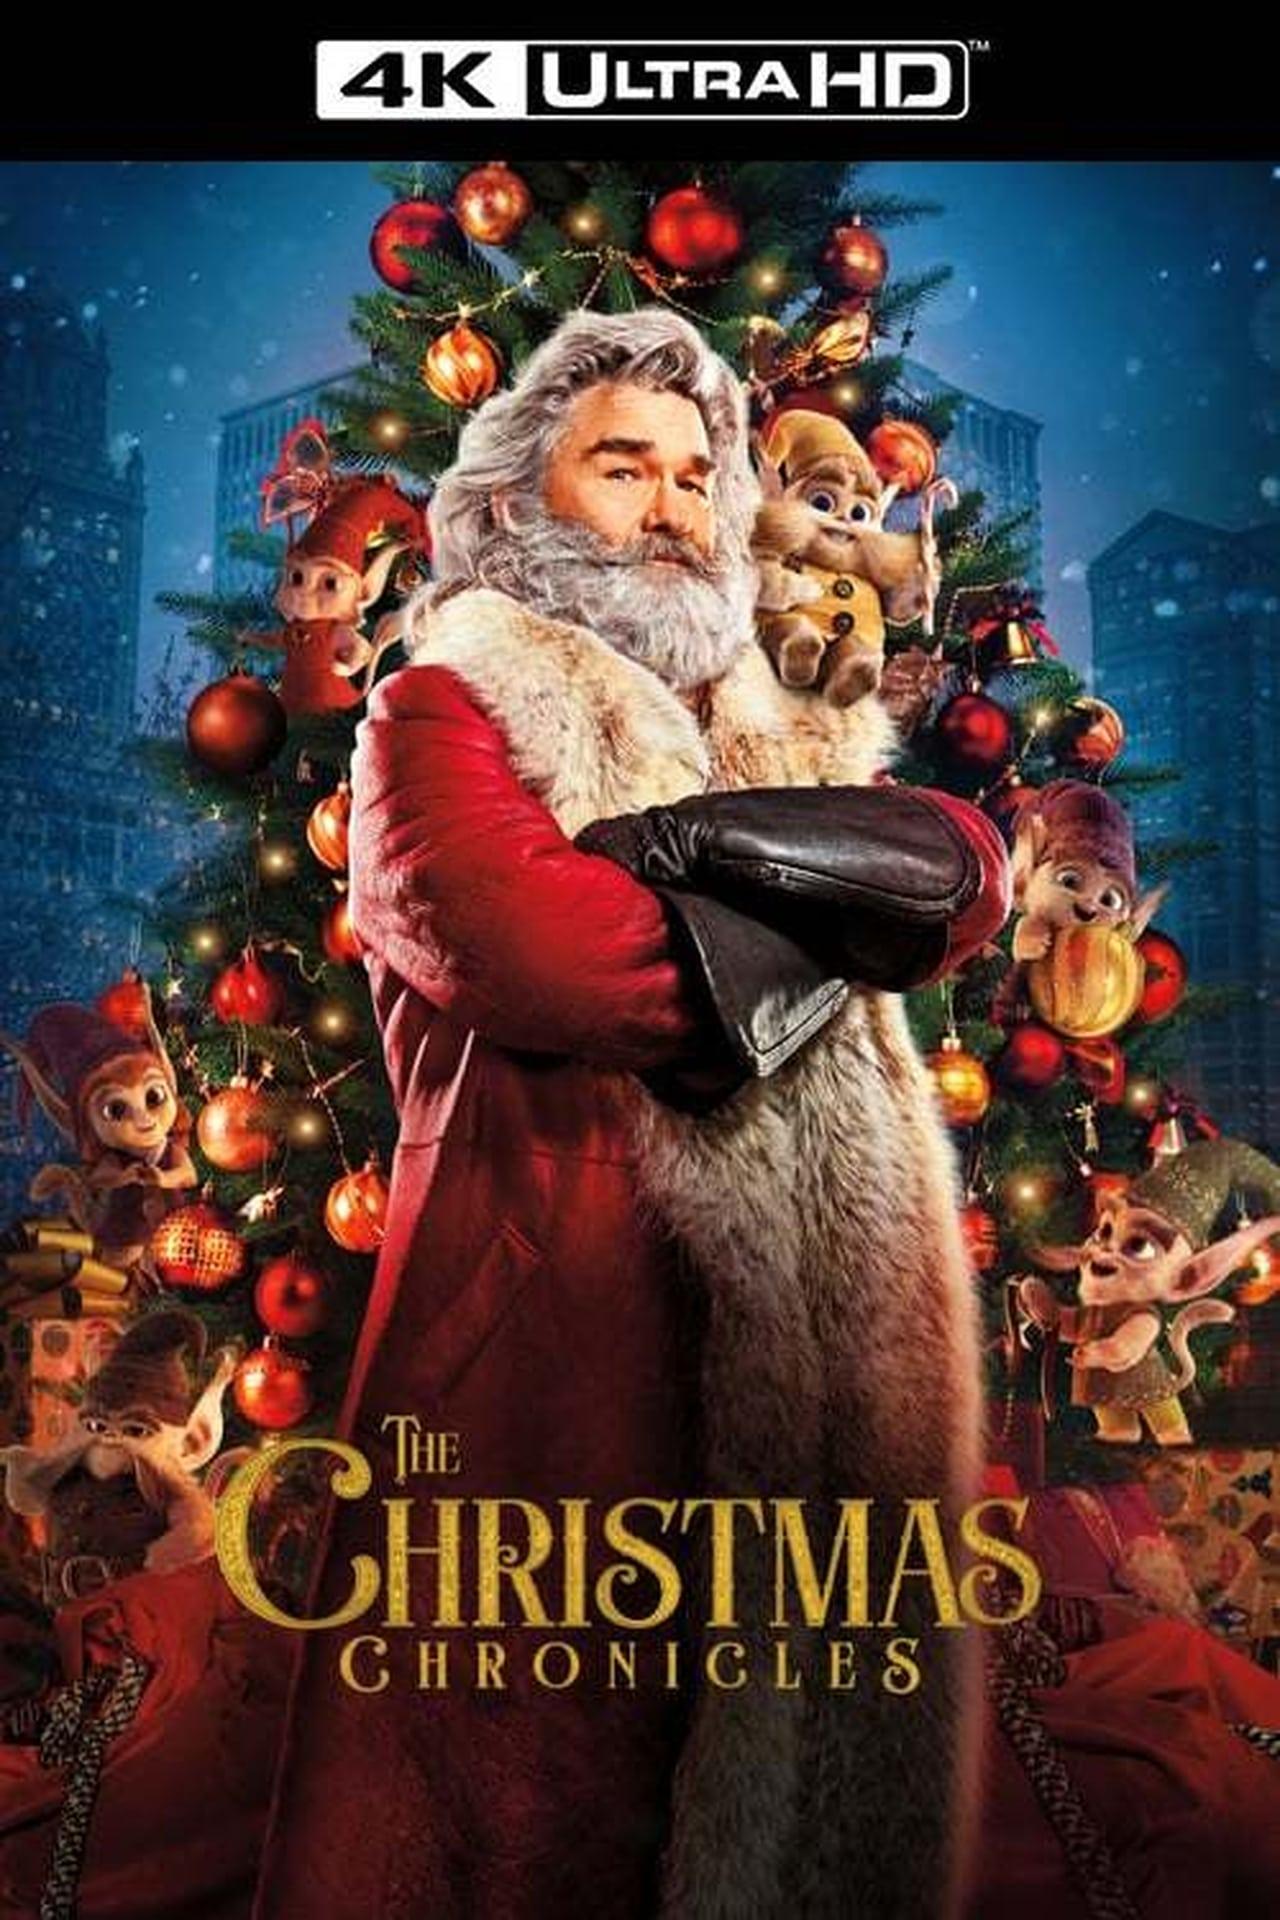 The Christmas Chronicles 2020 Hdrip Xvid Ac3-Evo The Christmas Chronicles subtitles Bulgarian   opensubtitles.com